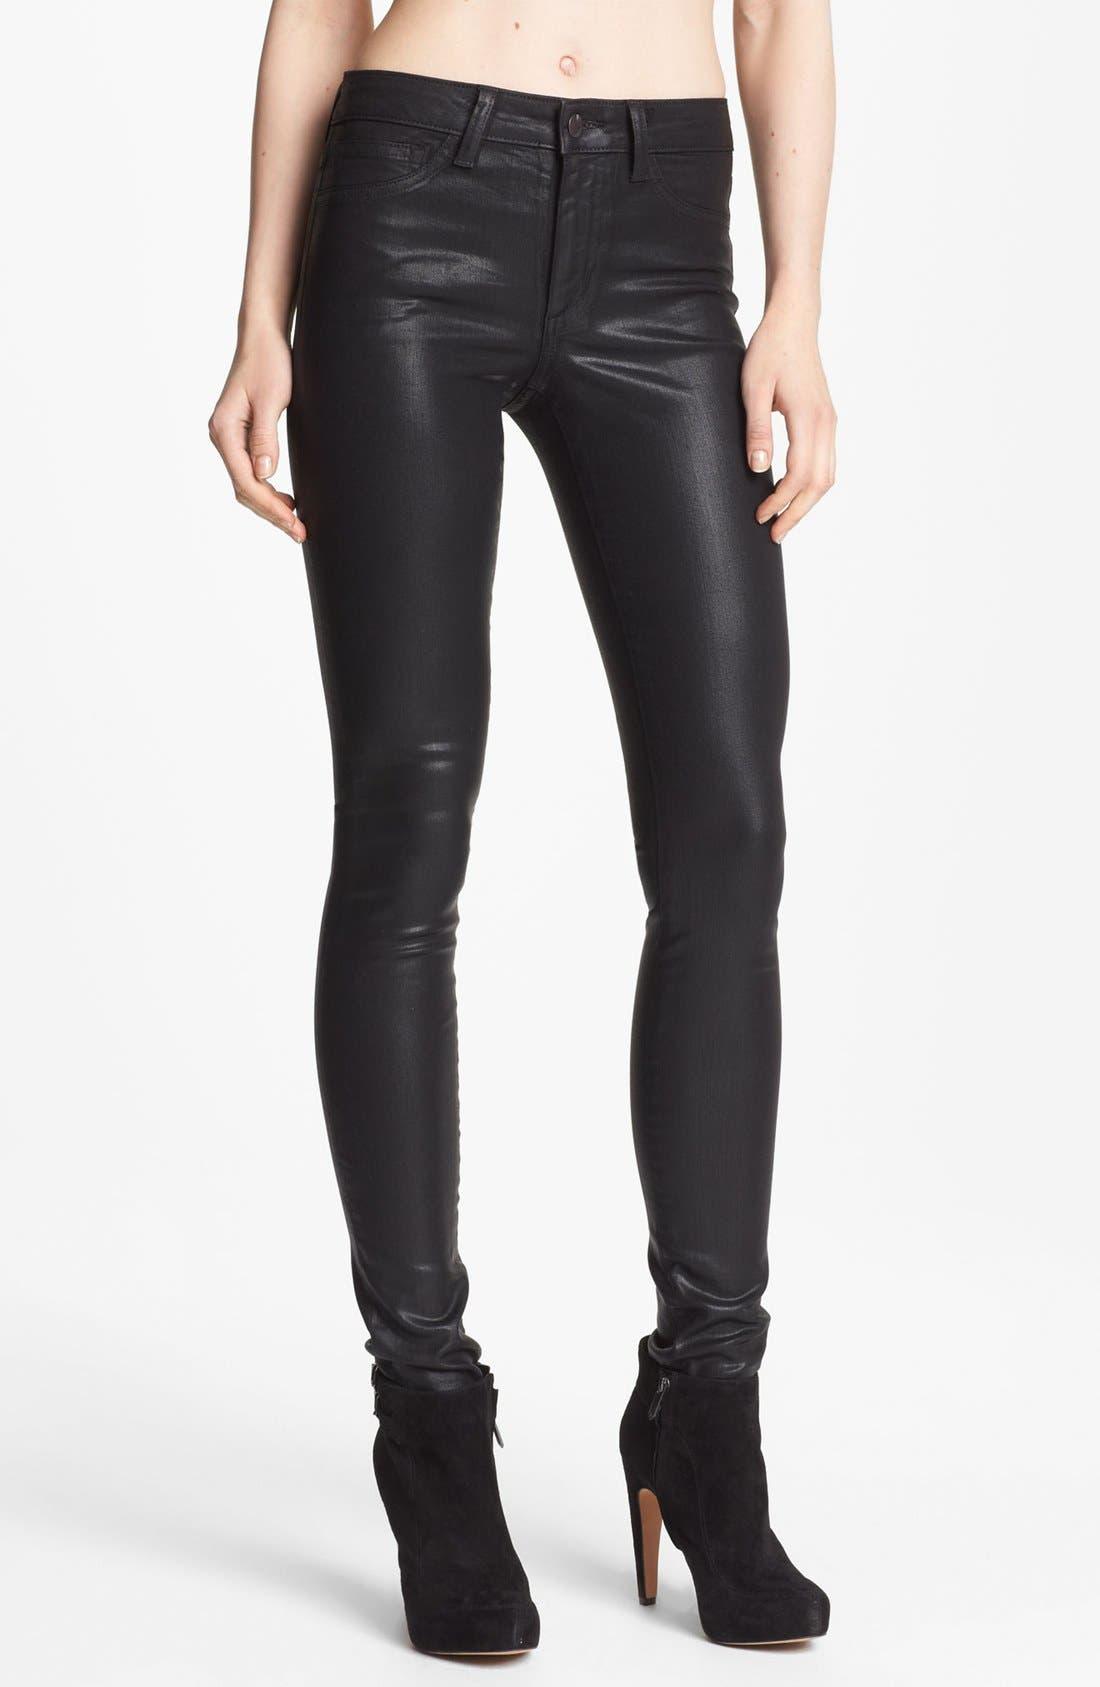 Main Image - Joe's 'The Skinny' Coated Stretch Jeans (Black)